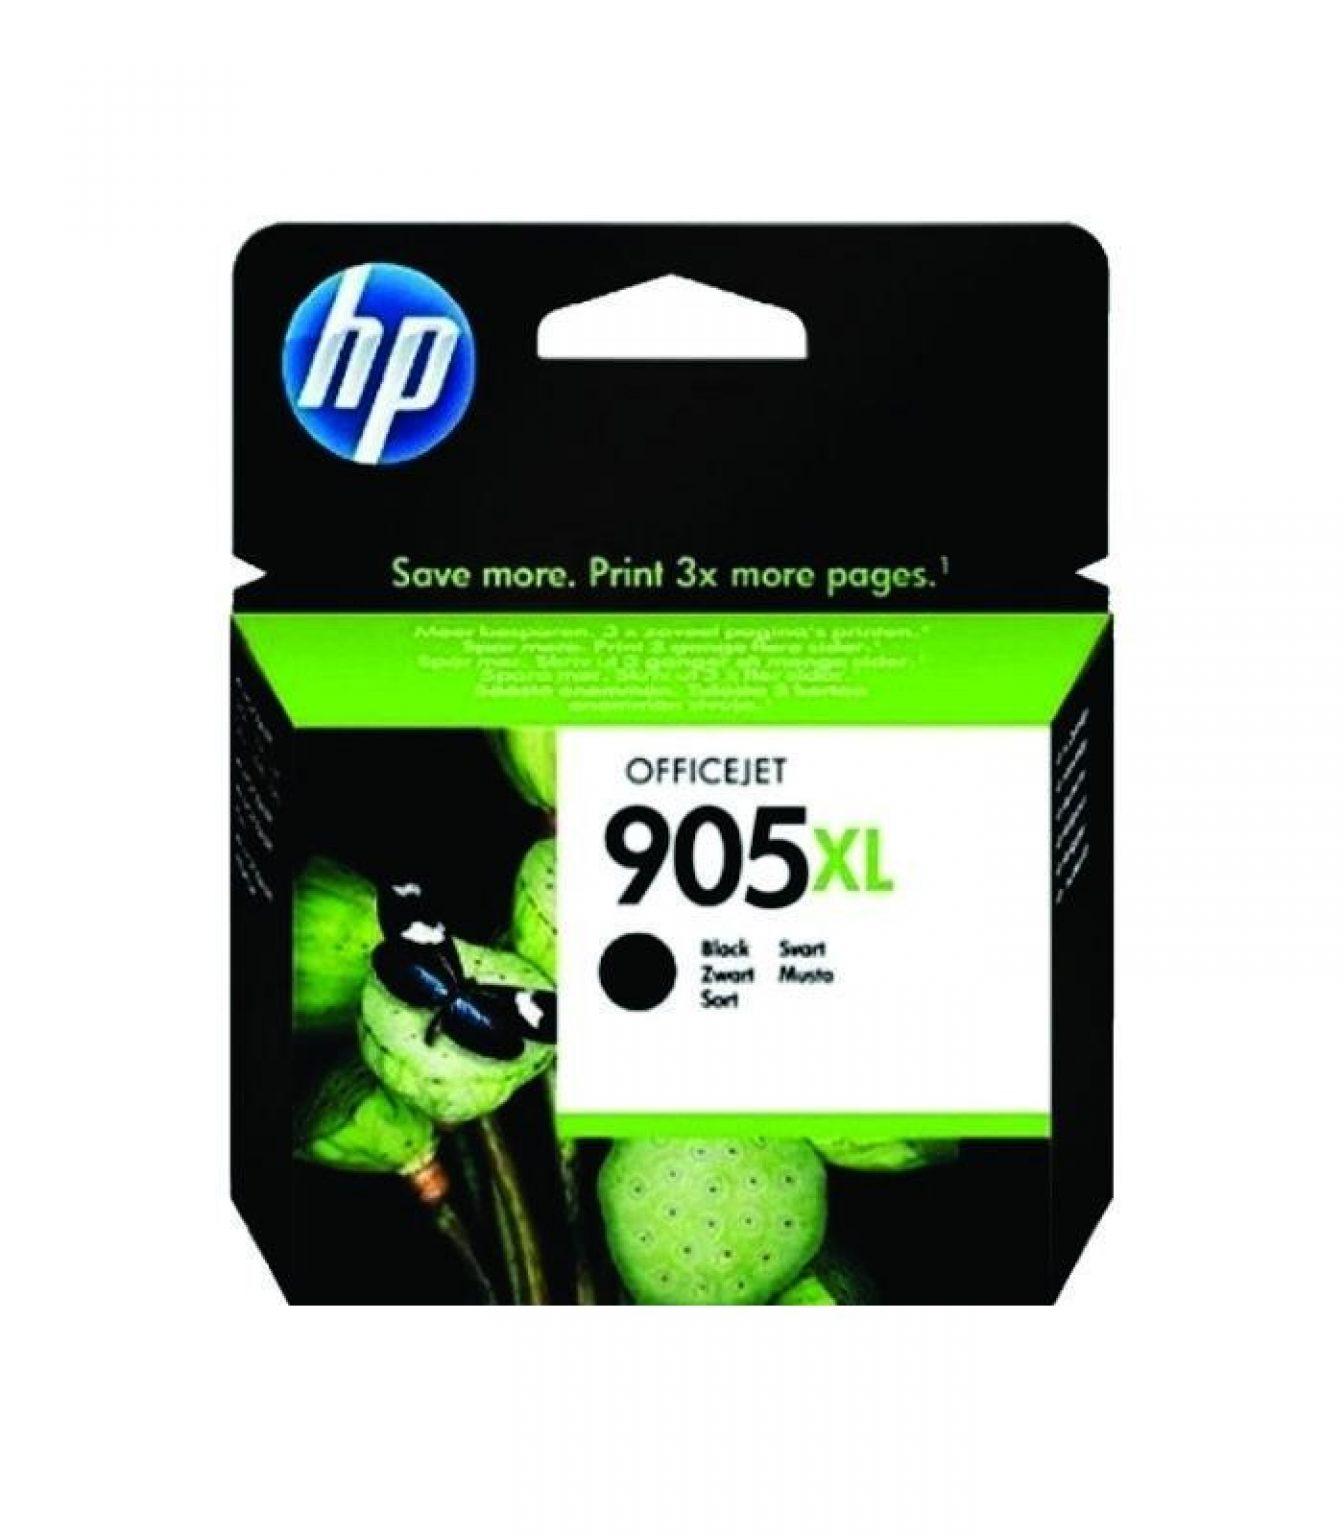 HP - 905XL Black Original Ink Cartridge [T6M17AA]